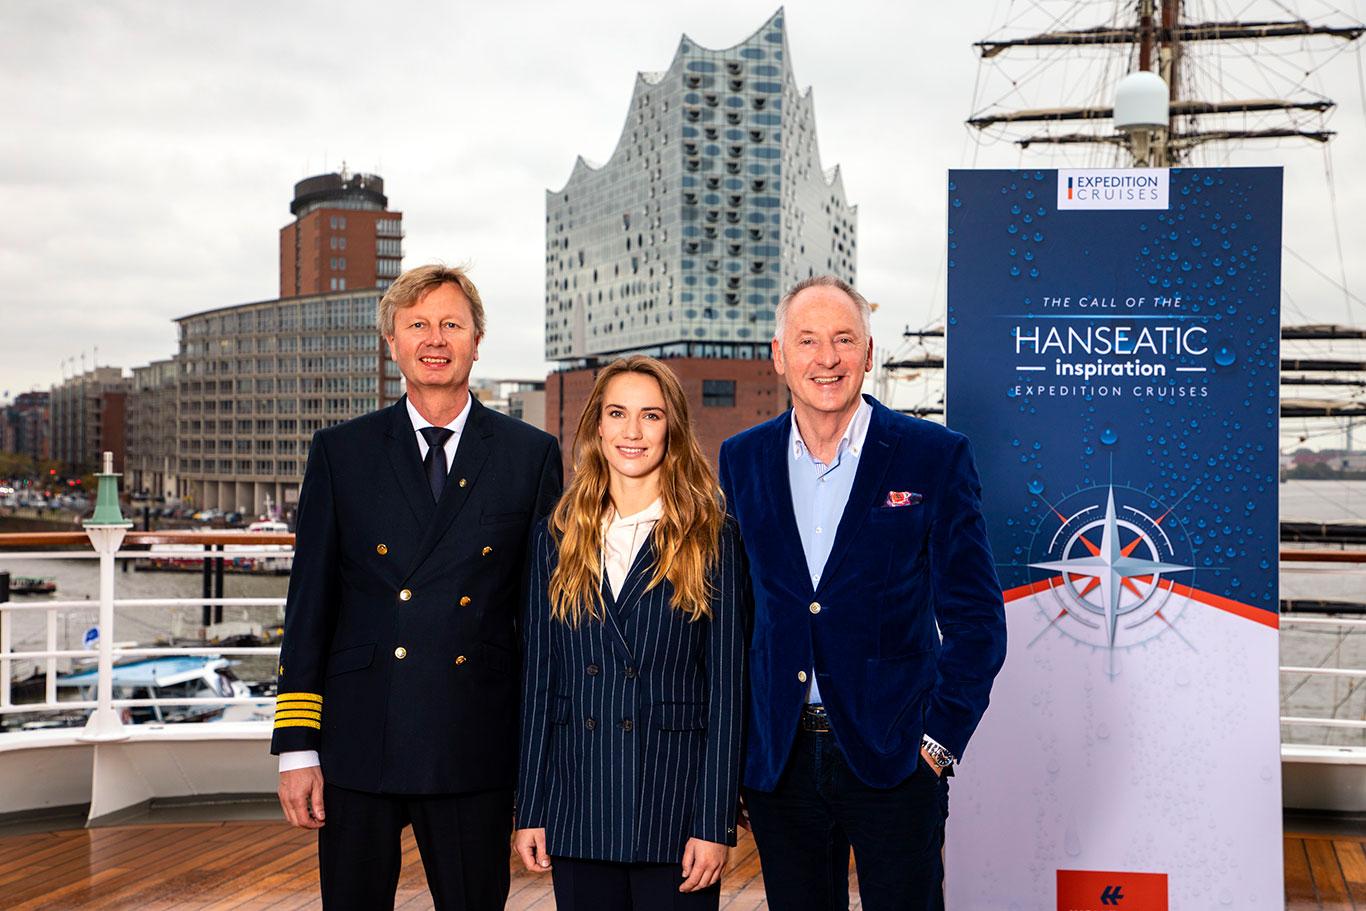 Hapag Lloyd, Hanseatic Inspiration christening